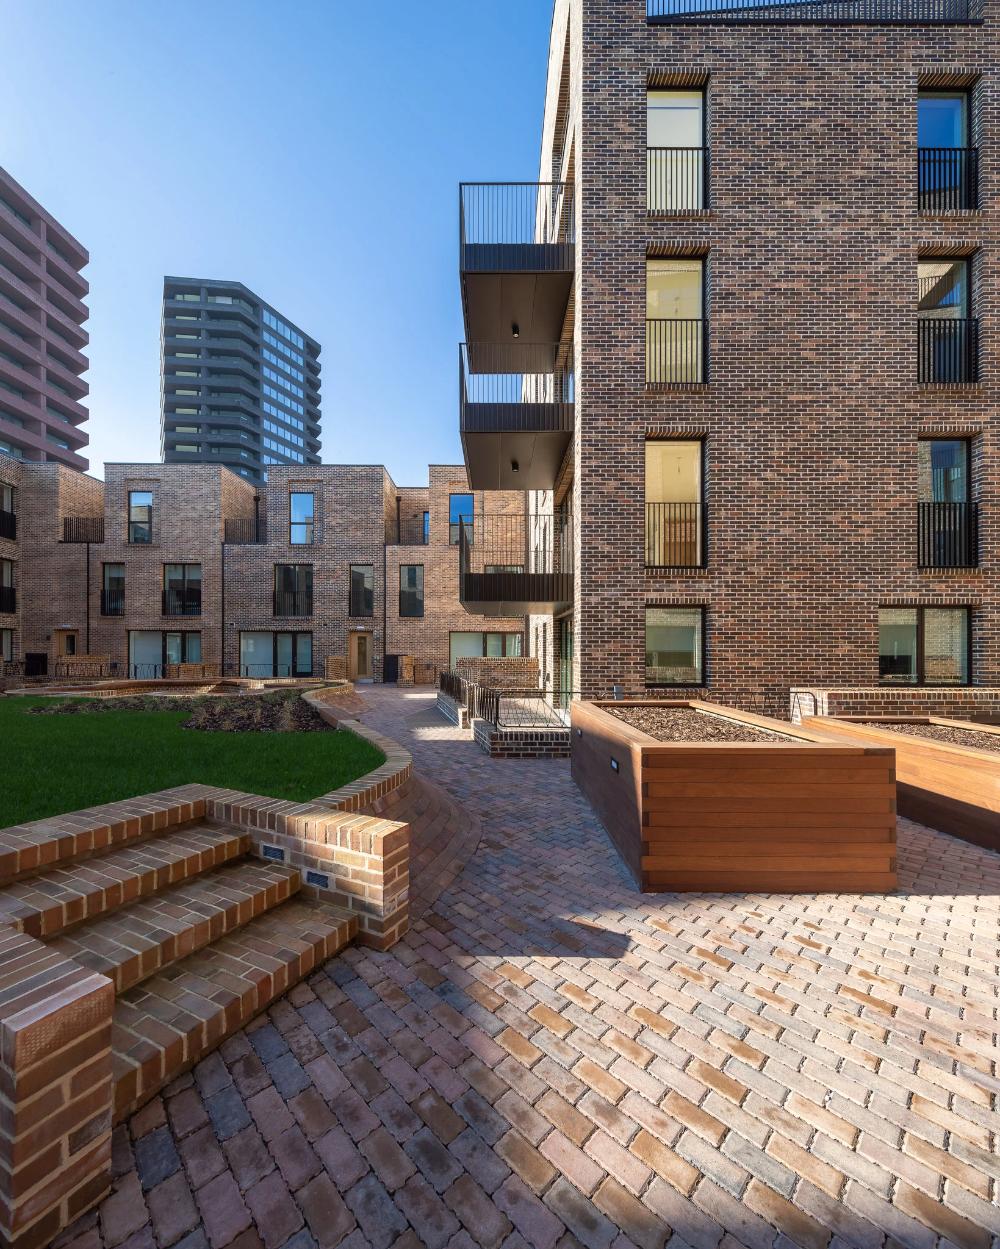 New York Has A Public Housing Problem Does London Have An Answer Published 2019 London Architecture Brick Architecture Brick Apartments